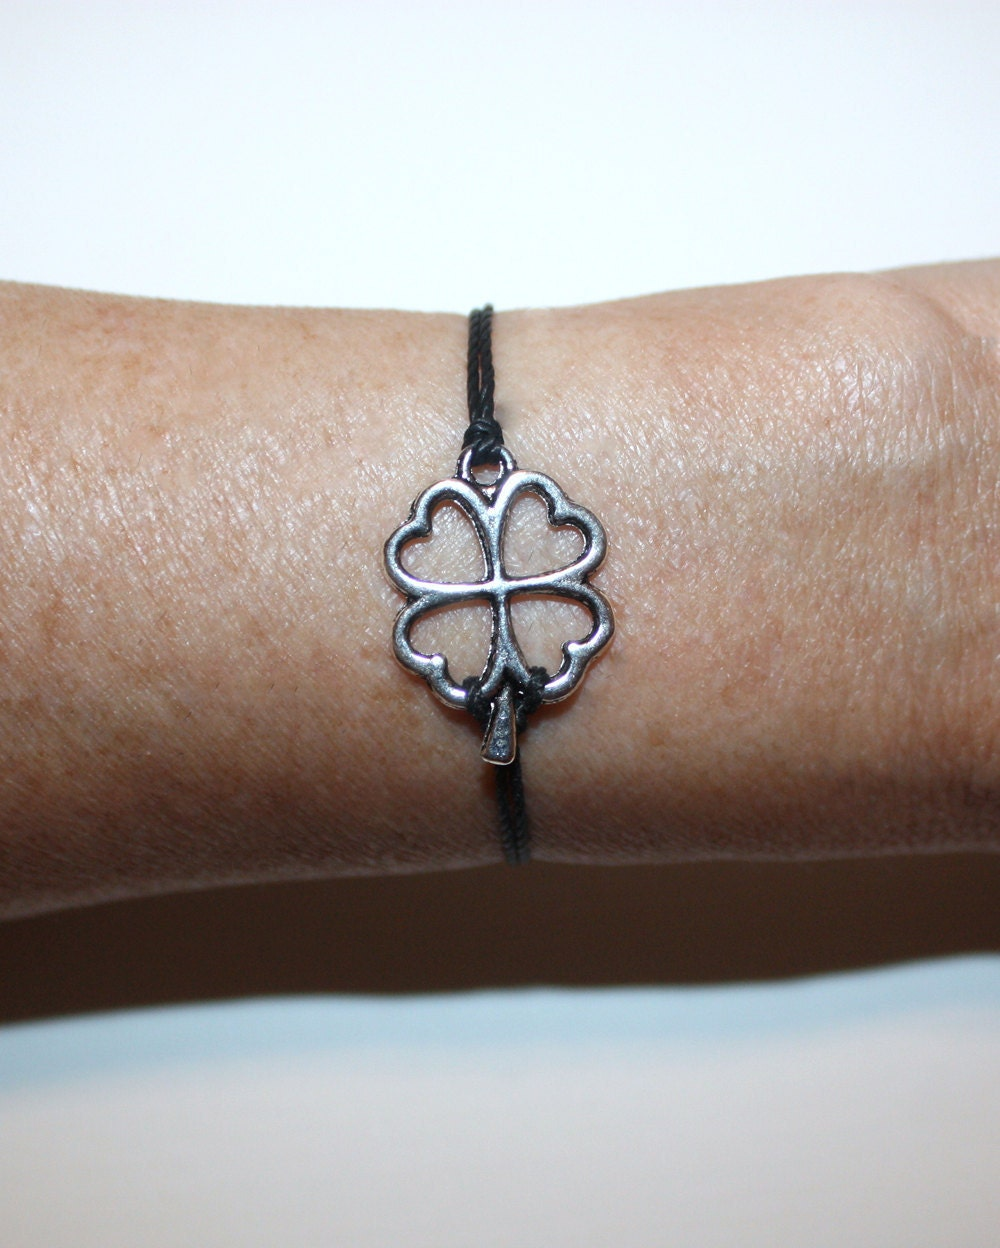 Four Leaf Clover Wish Bracelet - Shamrock - Tibetan Silver - BelieveInGoodKarma